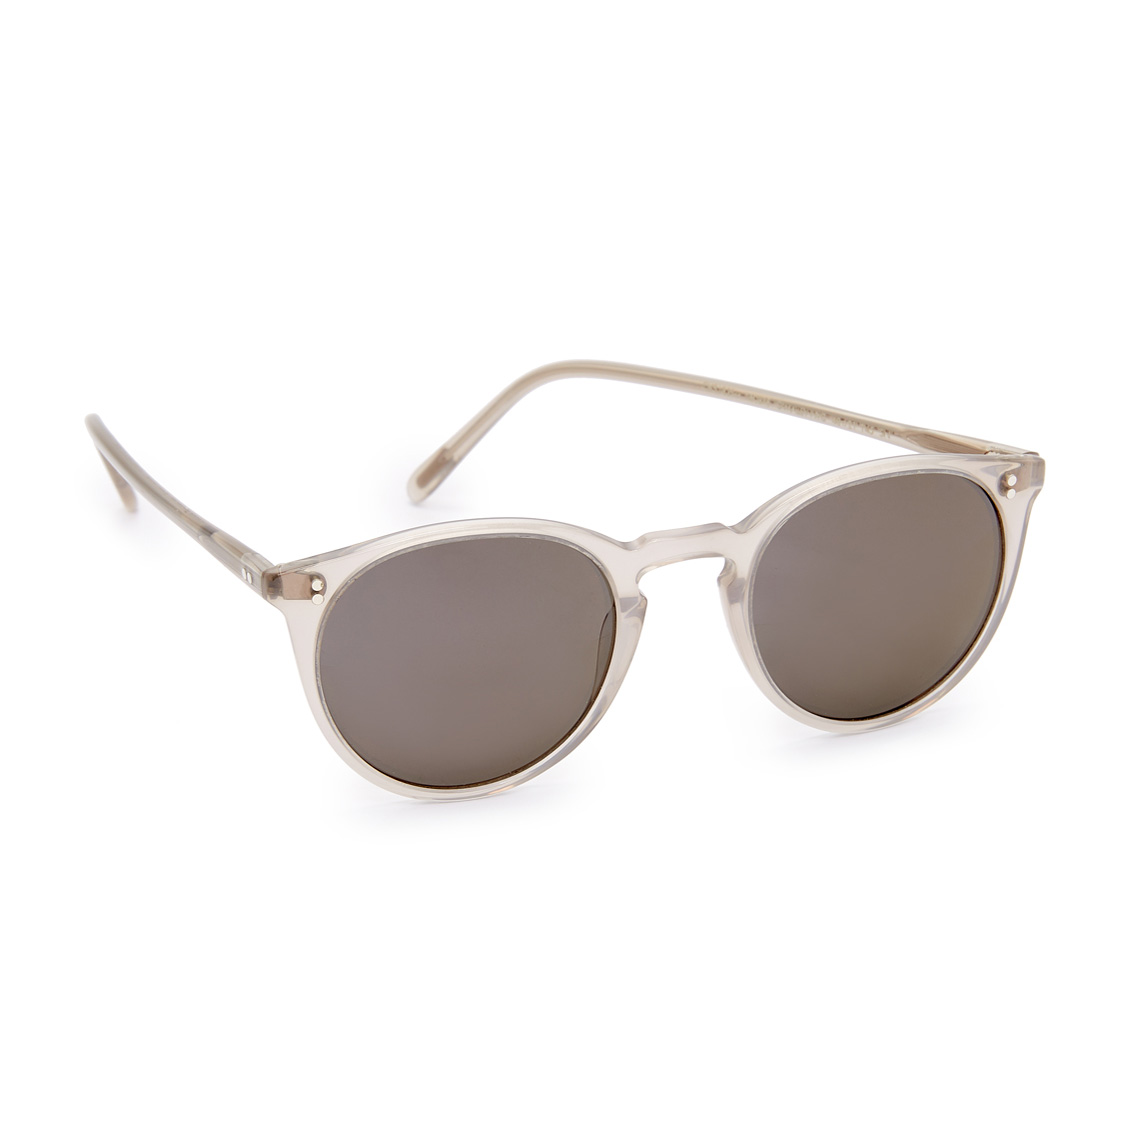 Oliver Peoples SunglassesMeghan O'malley The Maven Row 9HEID2